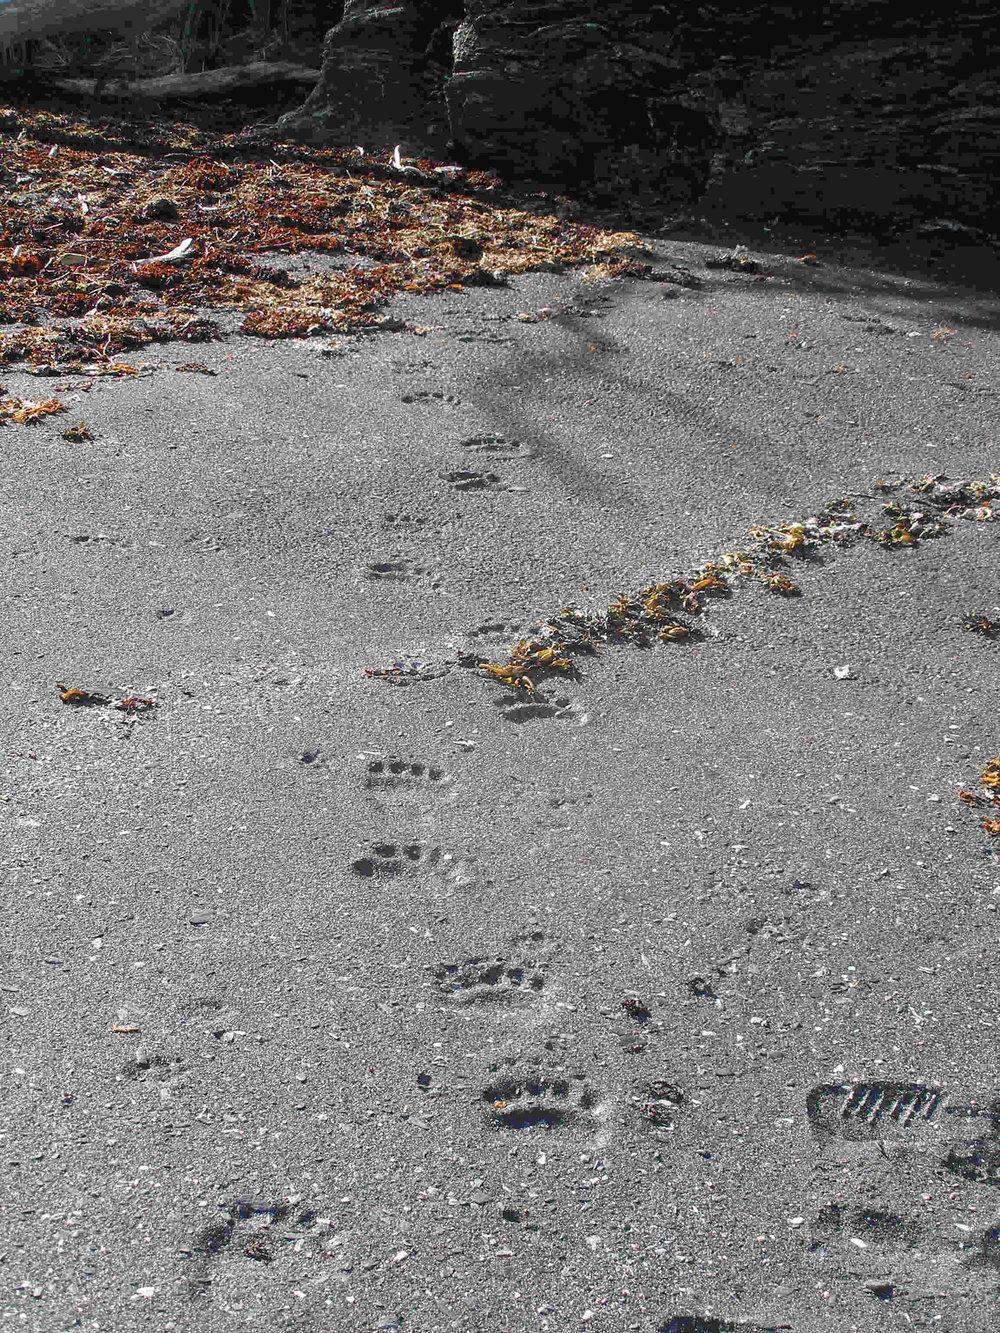 Kodiak brown bear tracks on the beach